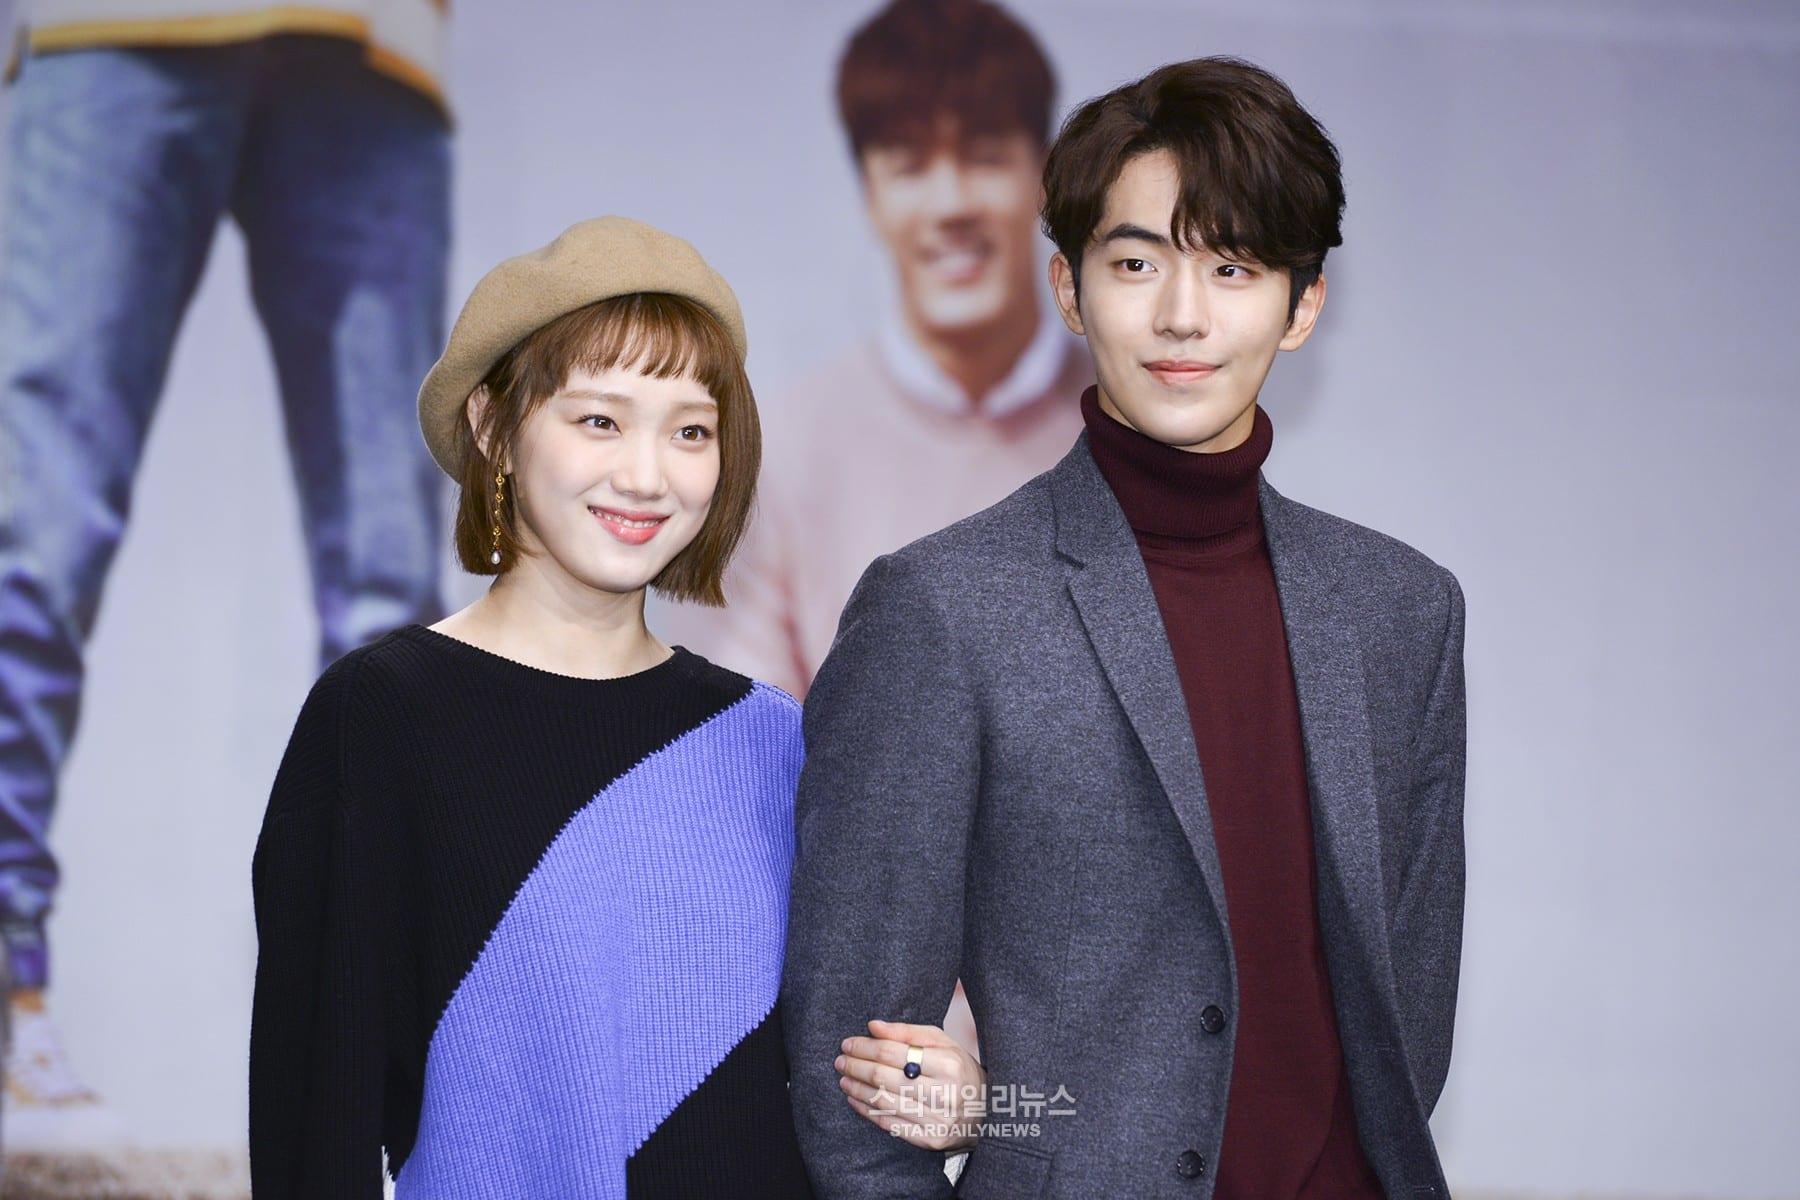 Nam joo hyuk dating rumors